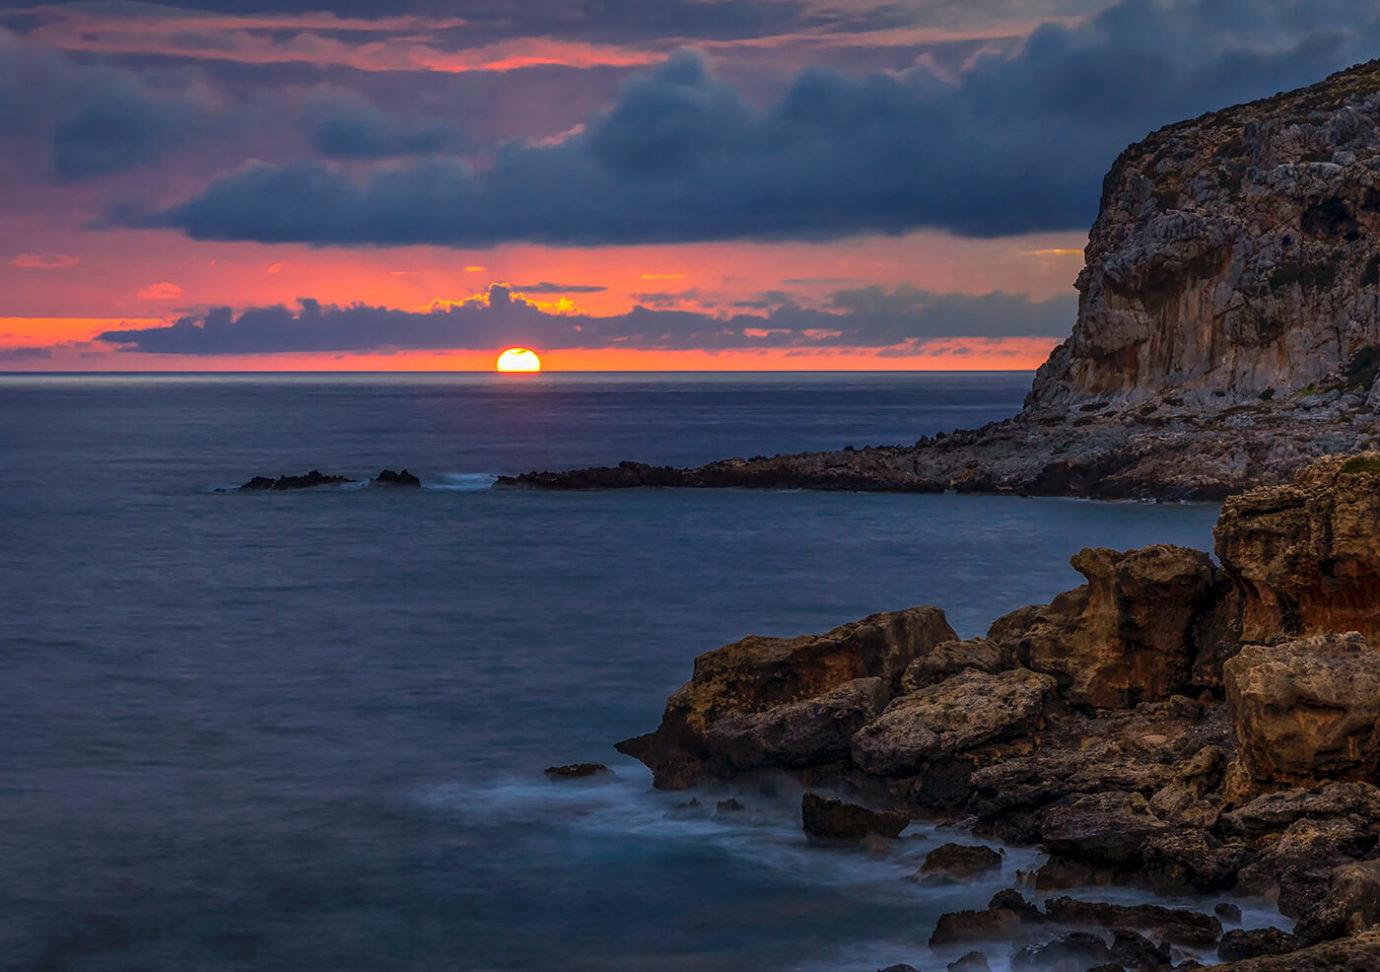 Sunset, Falassarna, Crete, Greece